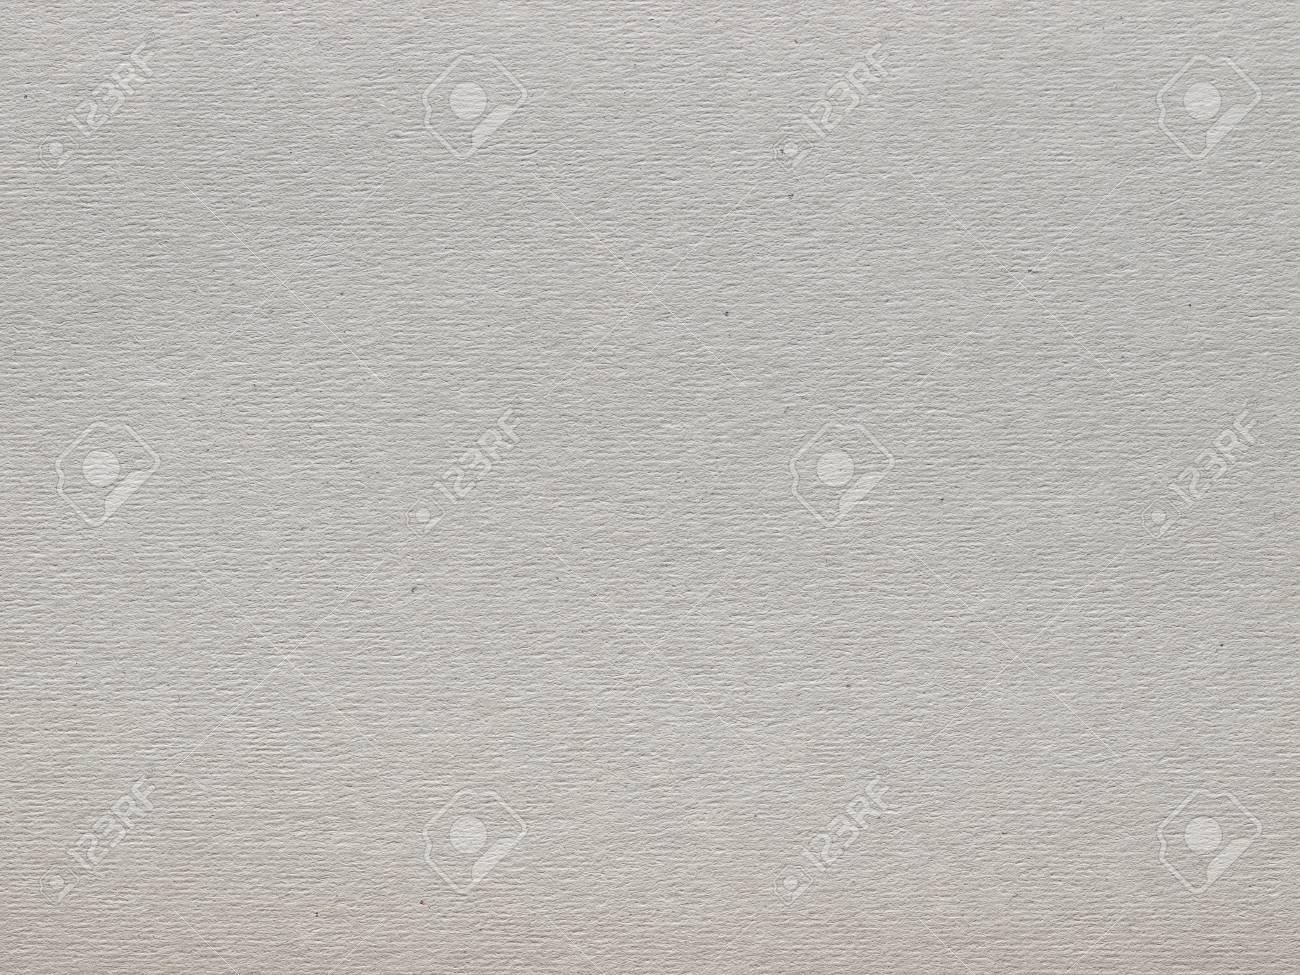 Antecedentes De Un Cartón De La Estructura Horizontal Pequeña